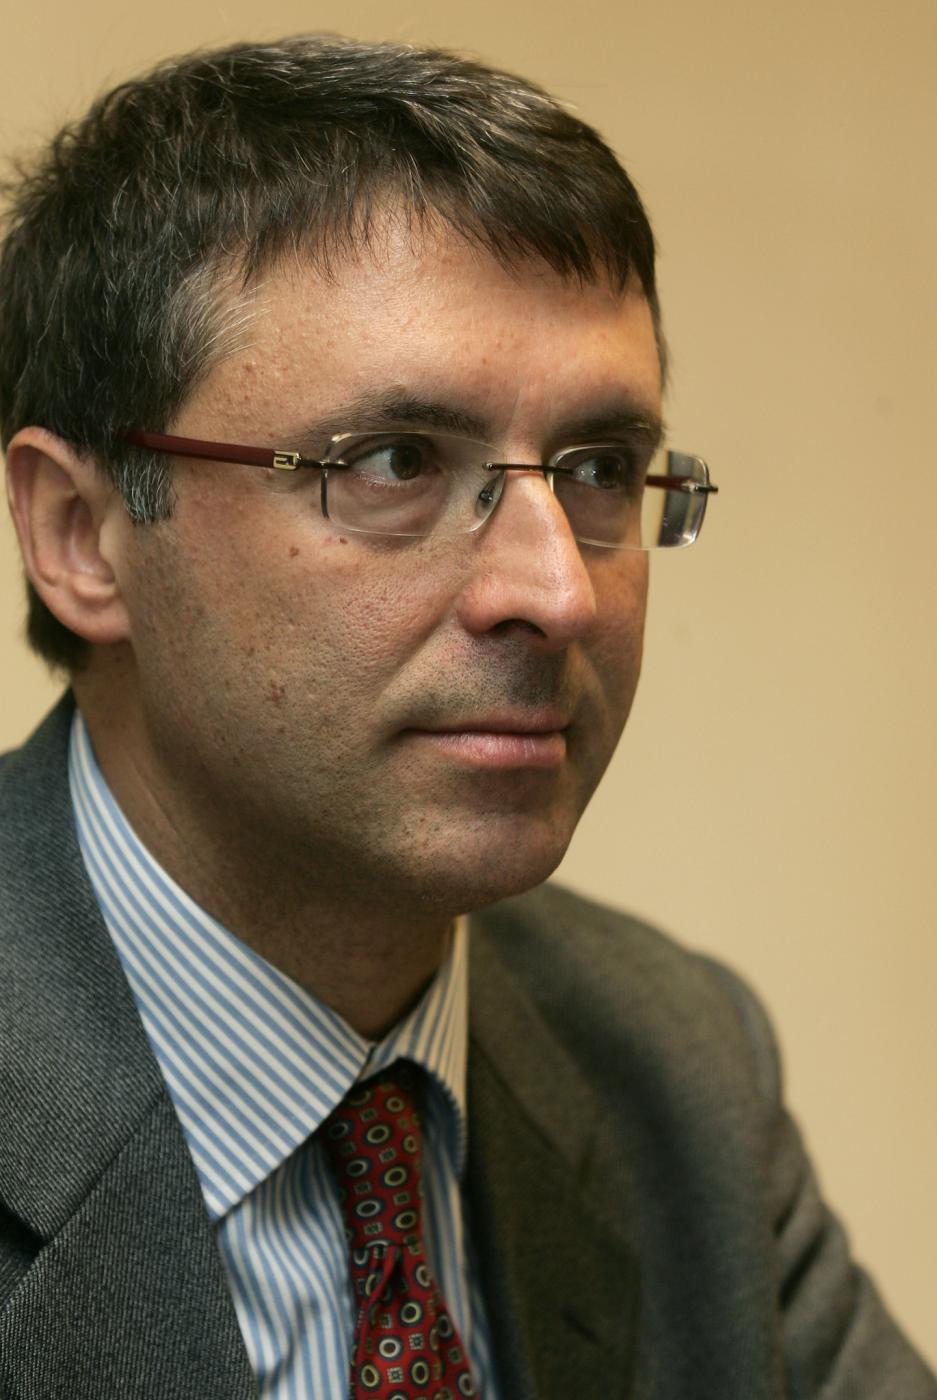 Corruzione a Roma: l'accusa di Raffaele Cantone